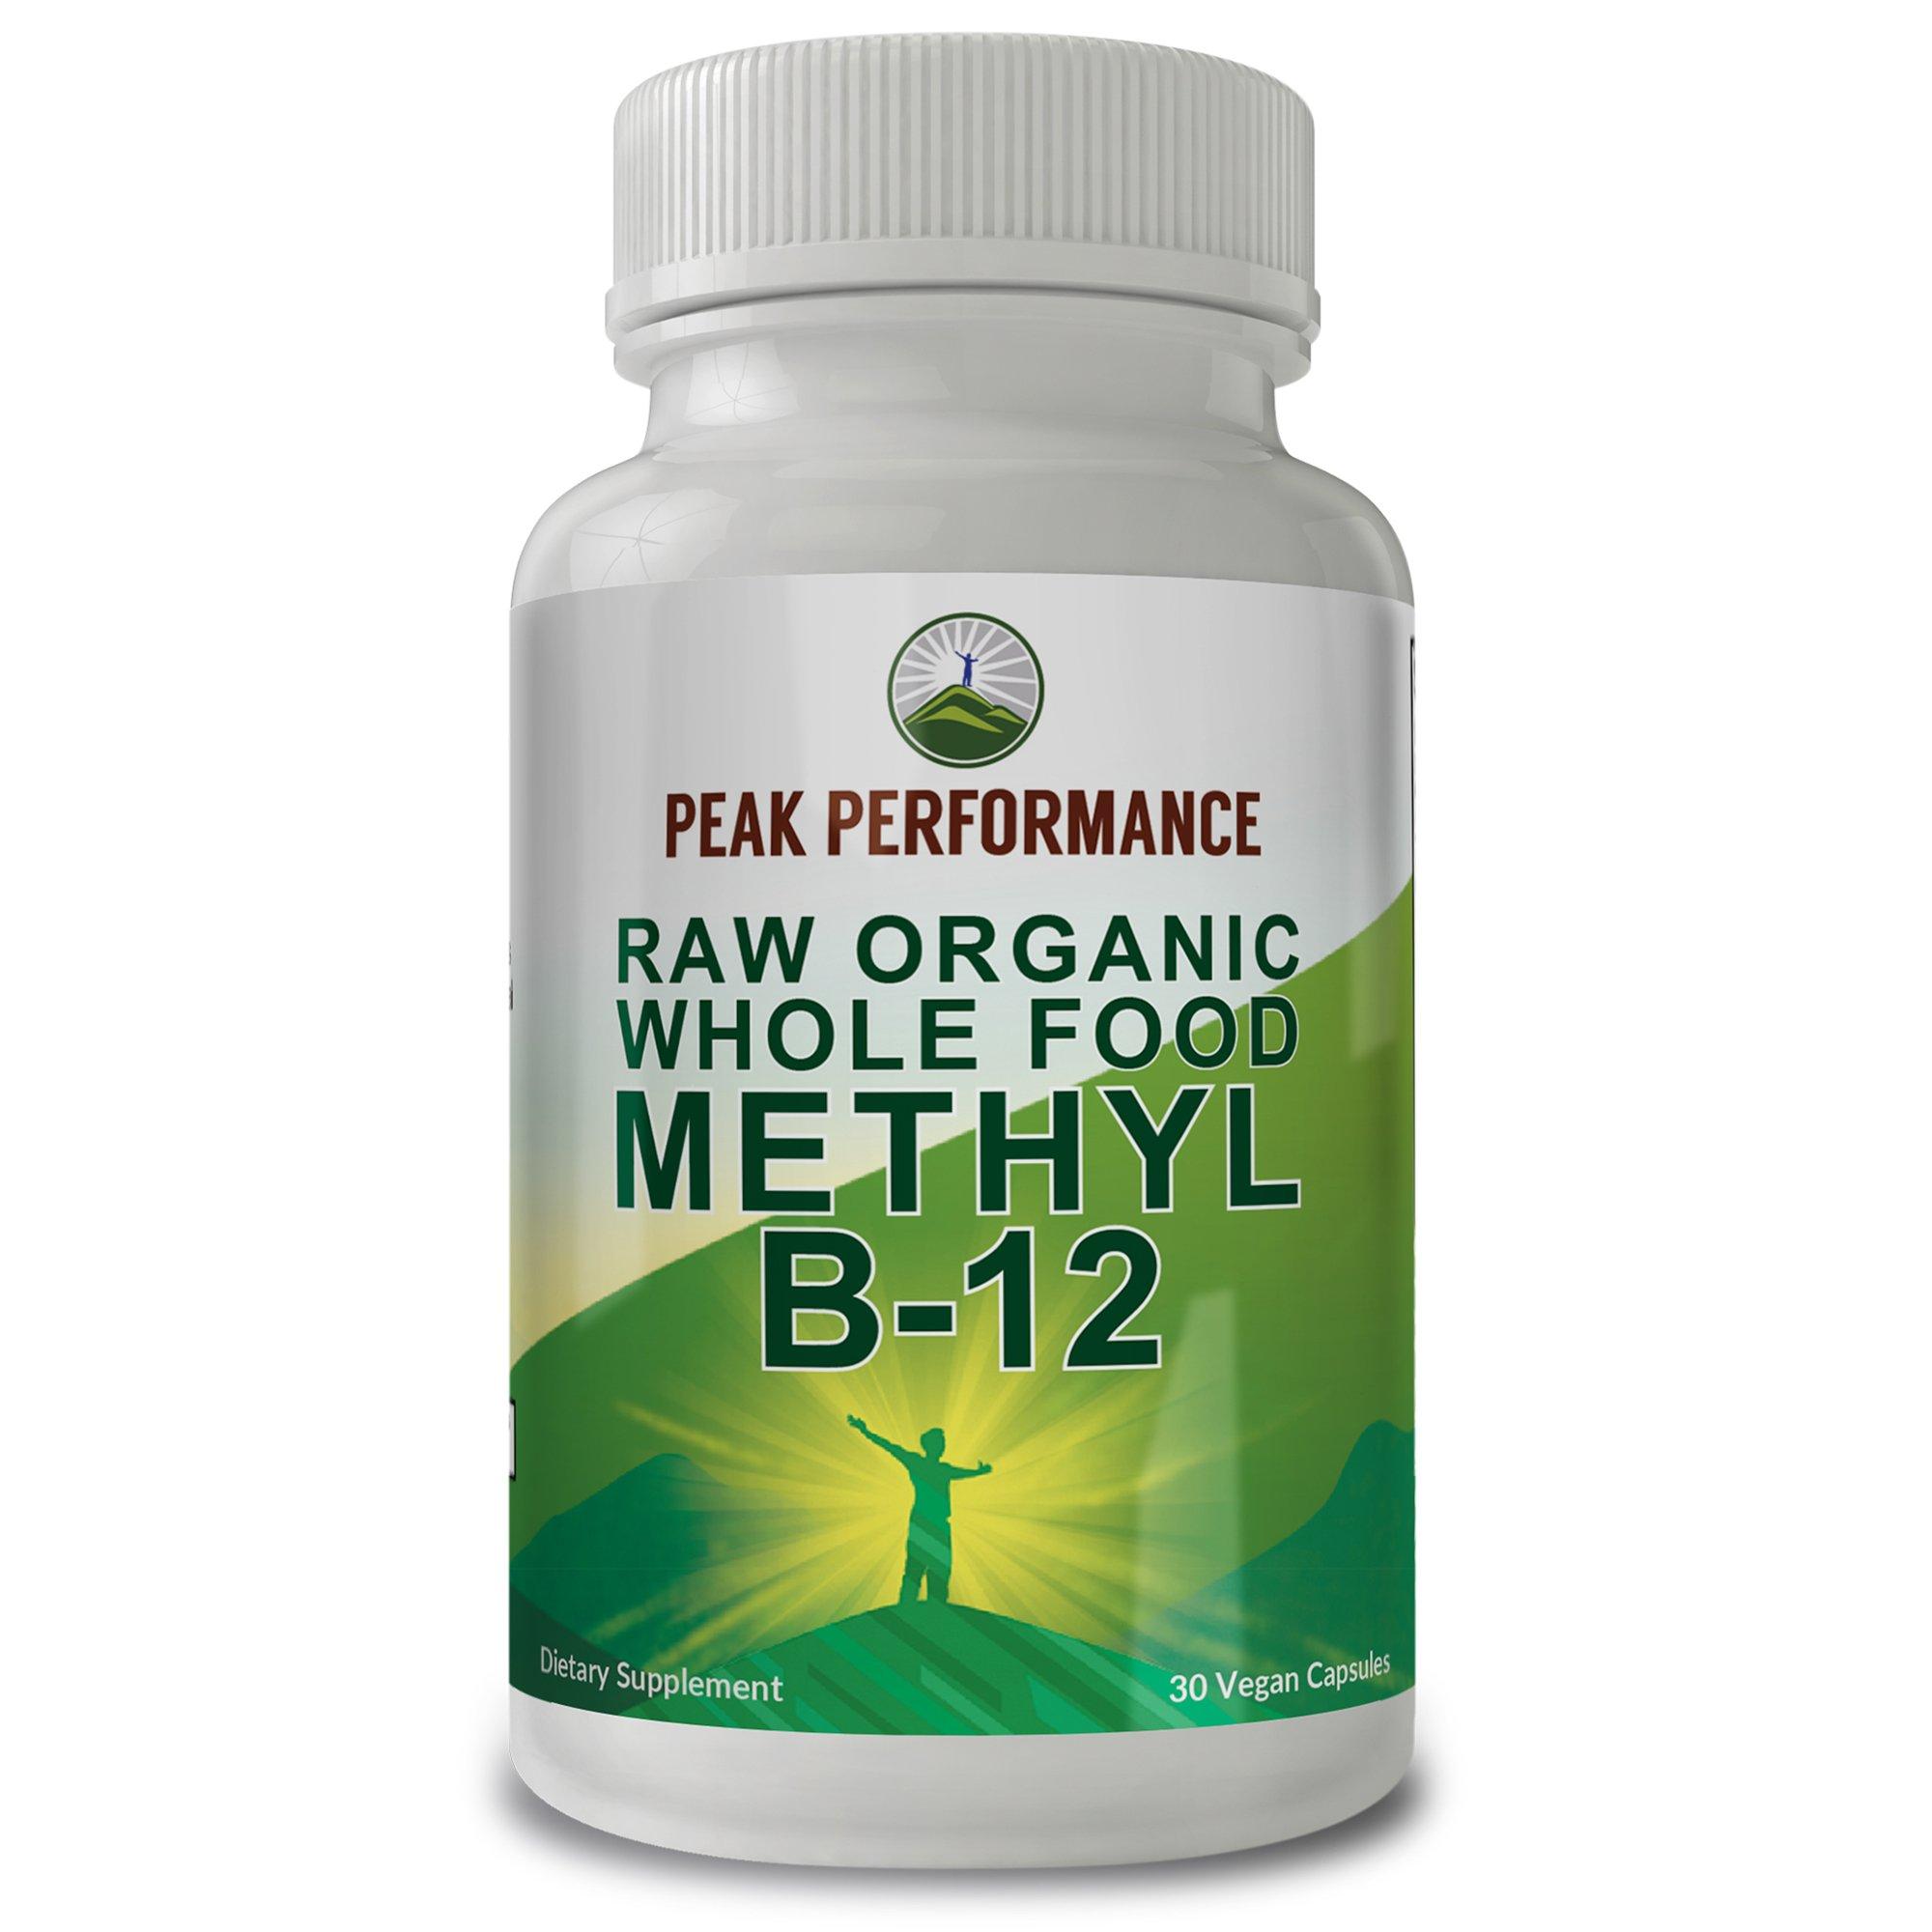 Raw Organic Whole Food B-12 by Peak Performance. Methylcobalamin (Methyl B12) Supplement with 25+ Organic Fruit & Vegetable Ingredients. 30 Vegan Capsules. for Healthy Brain and Nervous System